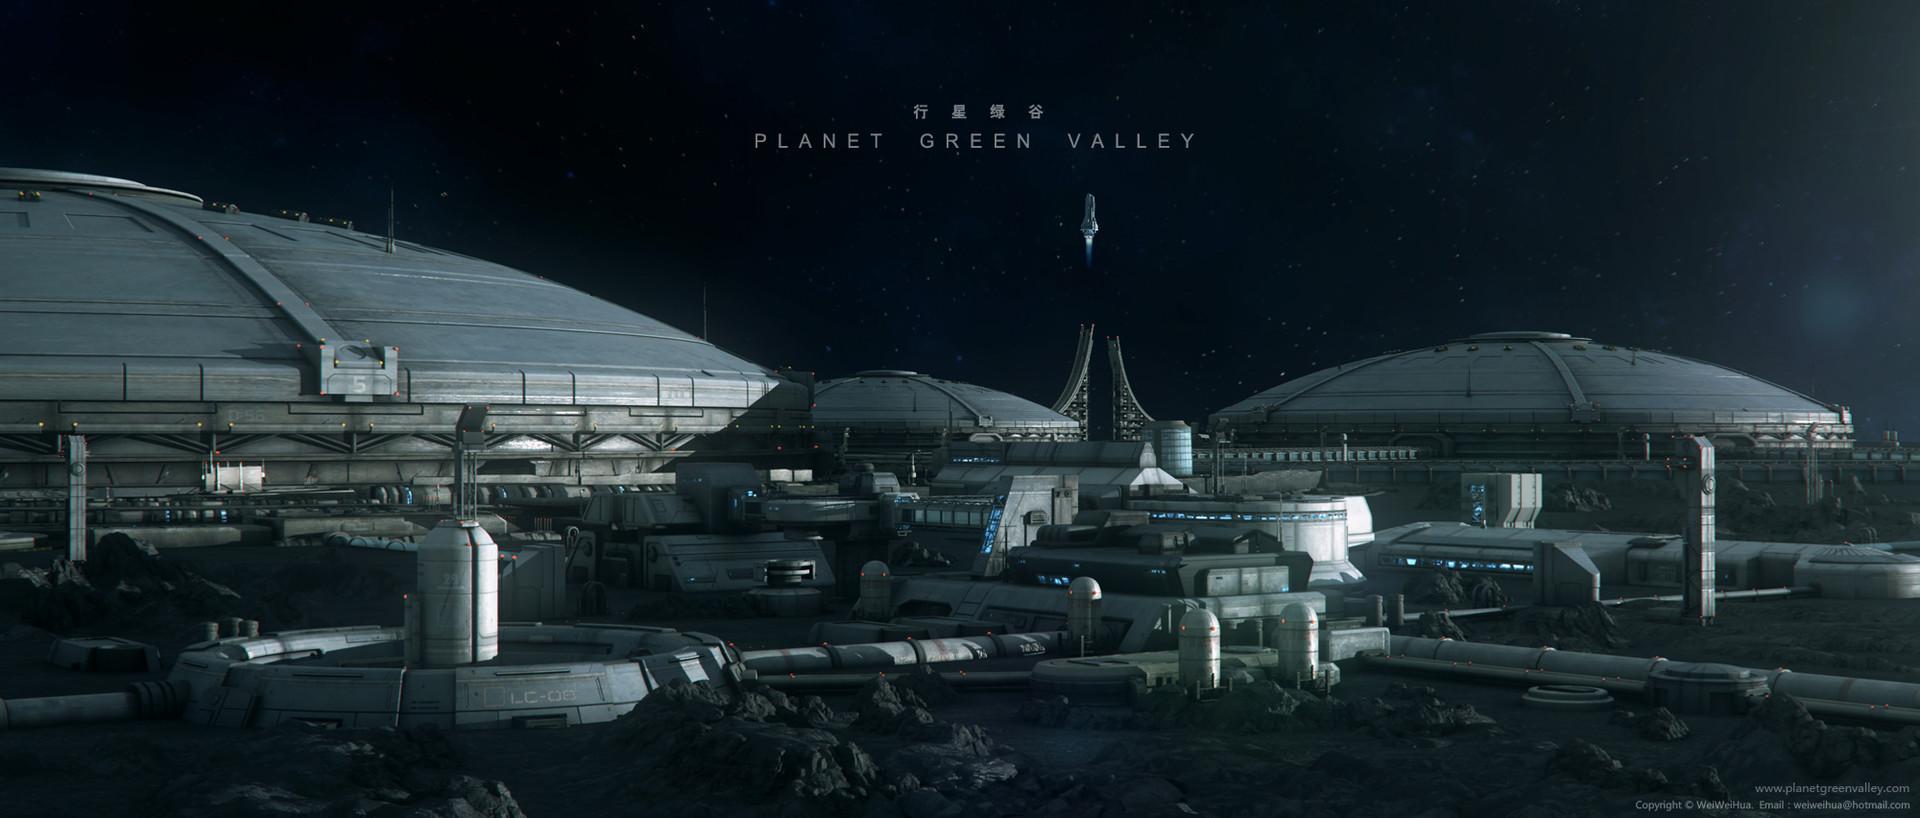 wei-weihua-moon-base.jpg?1503386152